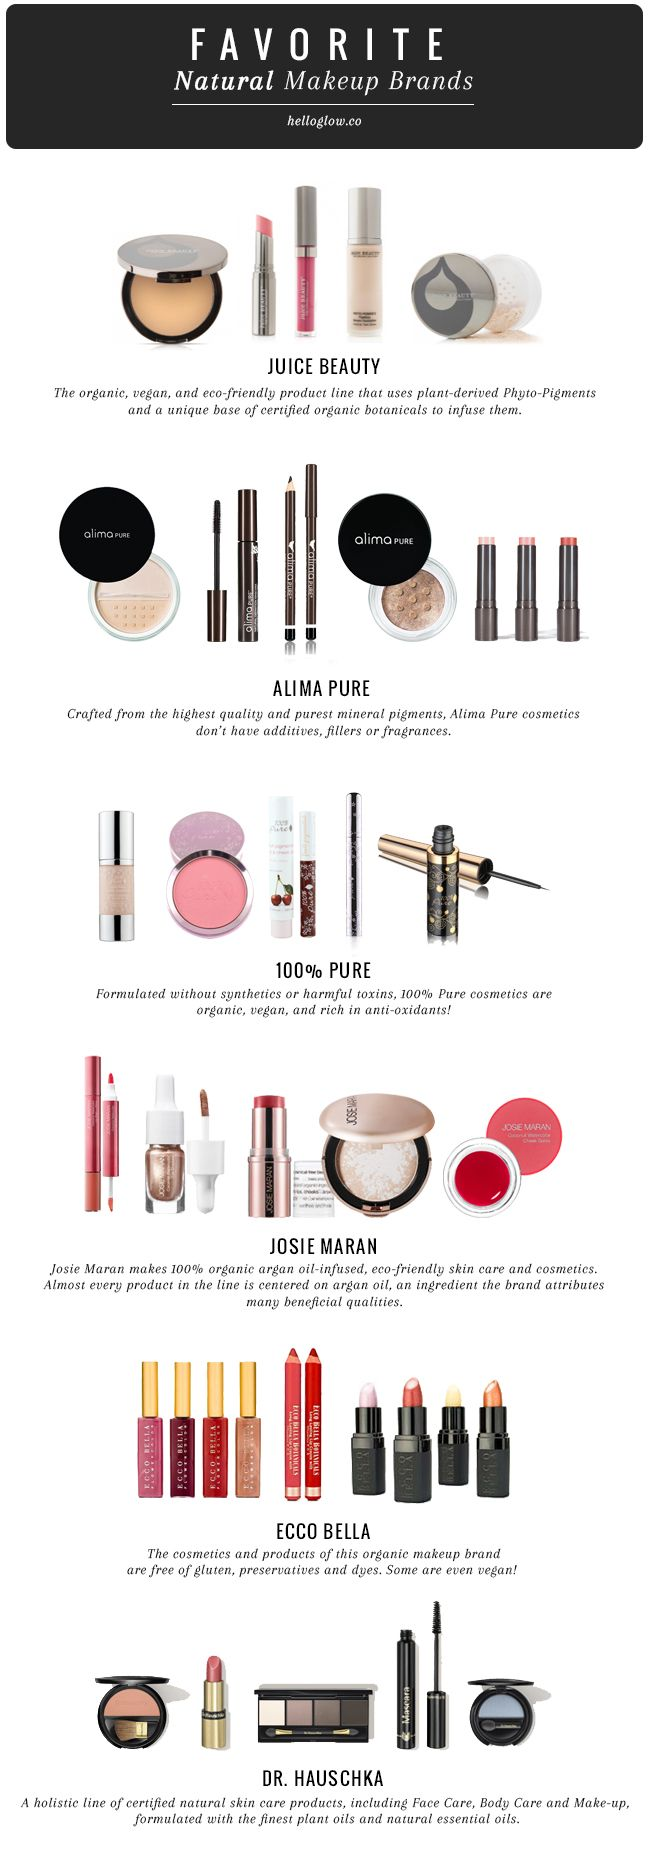 9 Green Makeup Brands You Should Know | http://helloglow.co/best-natural-makeup-brands/